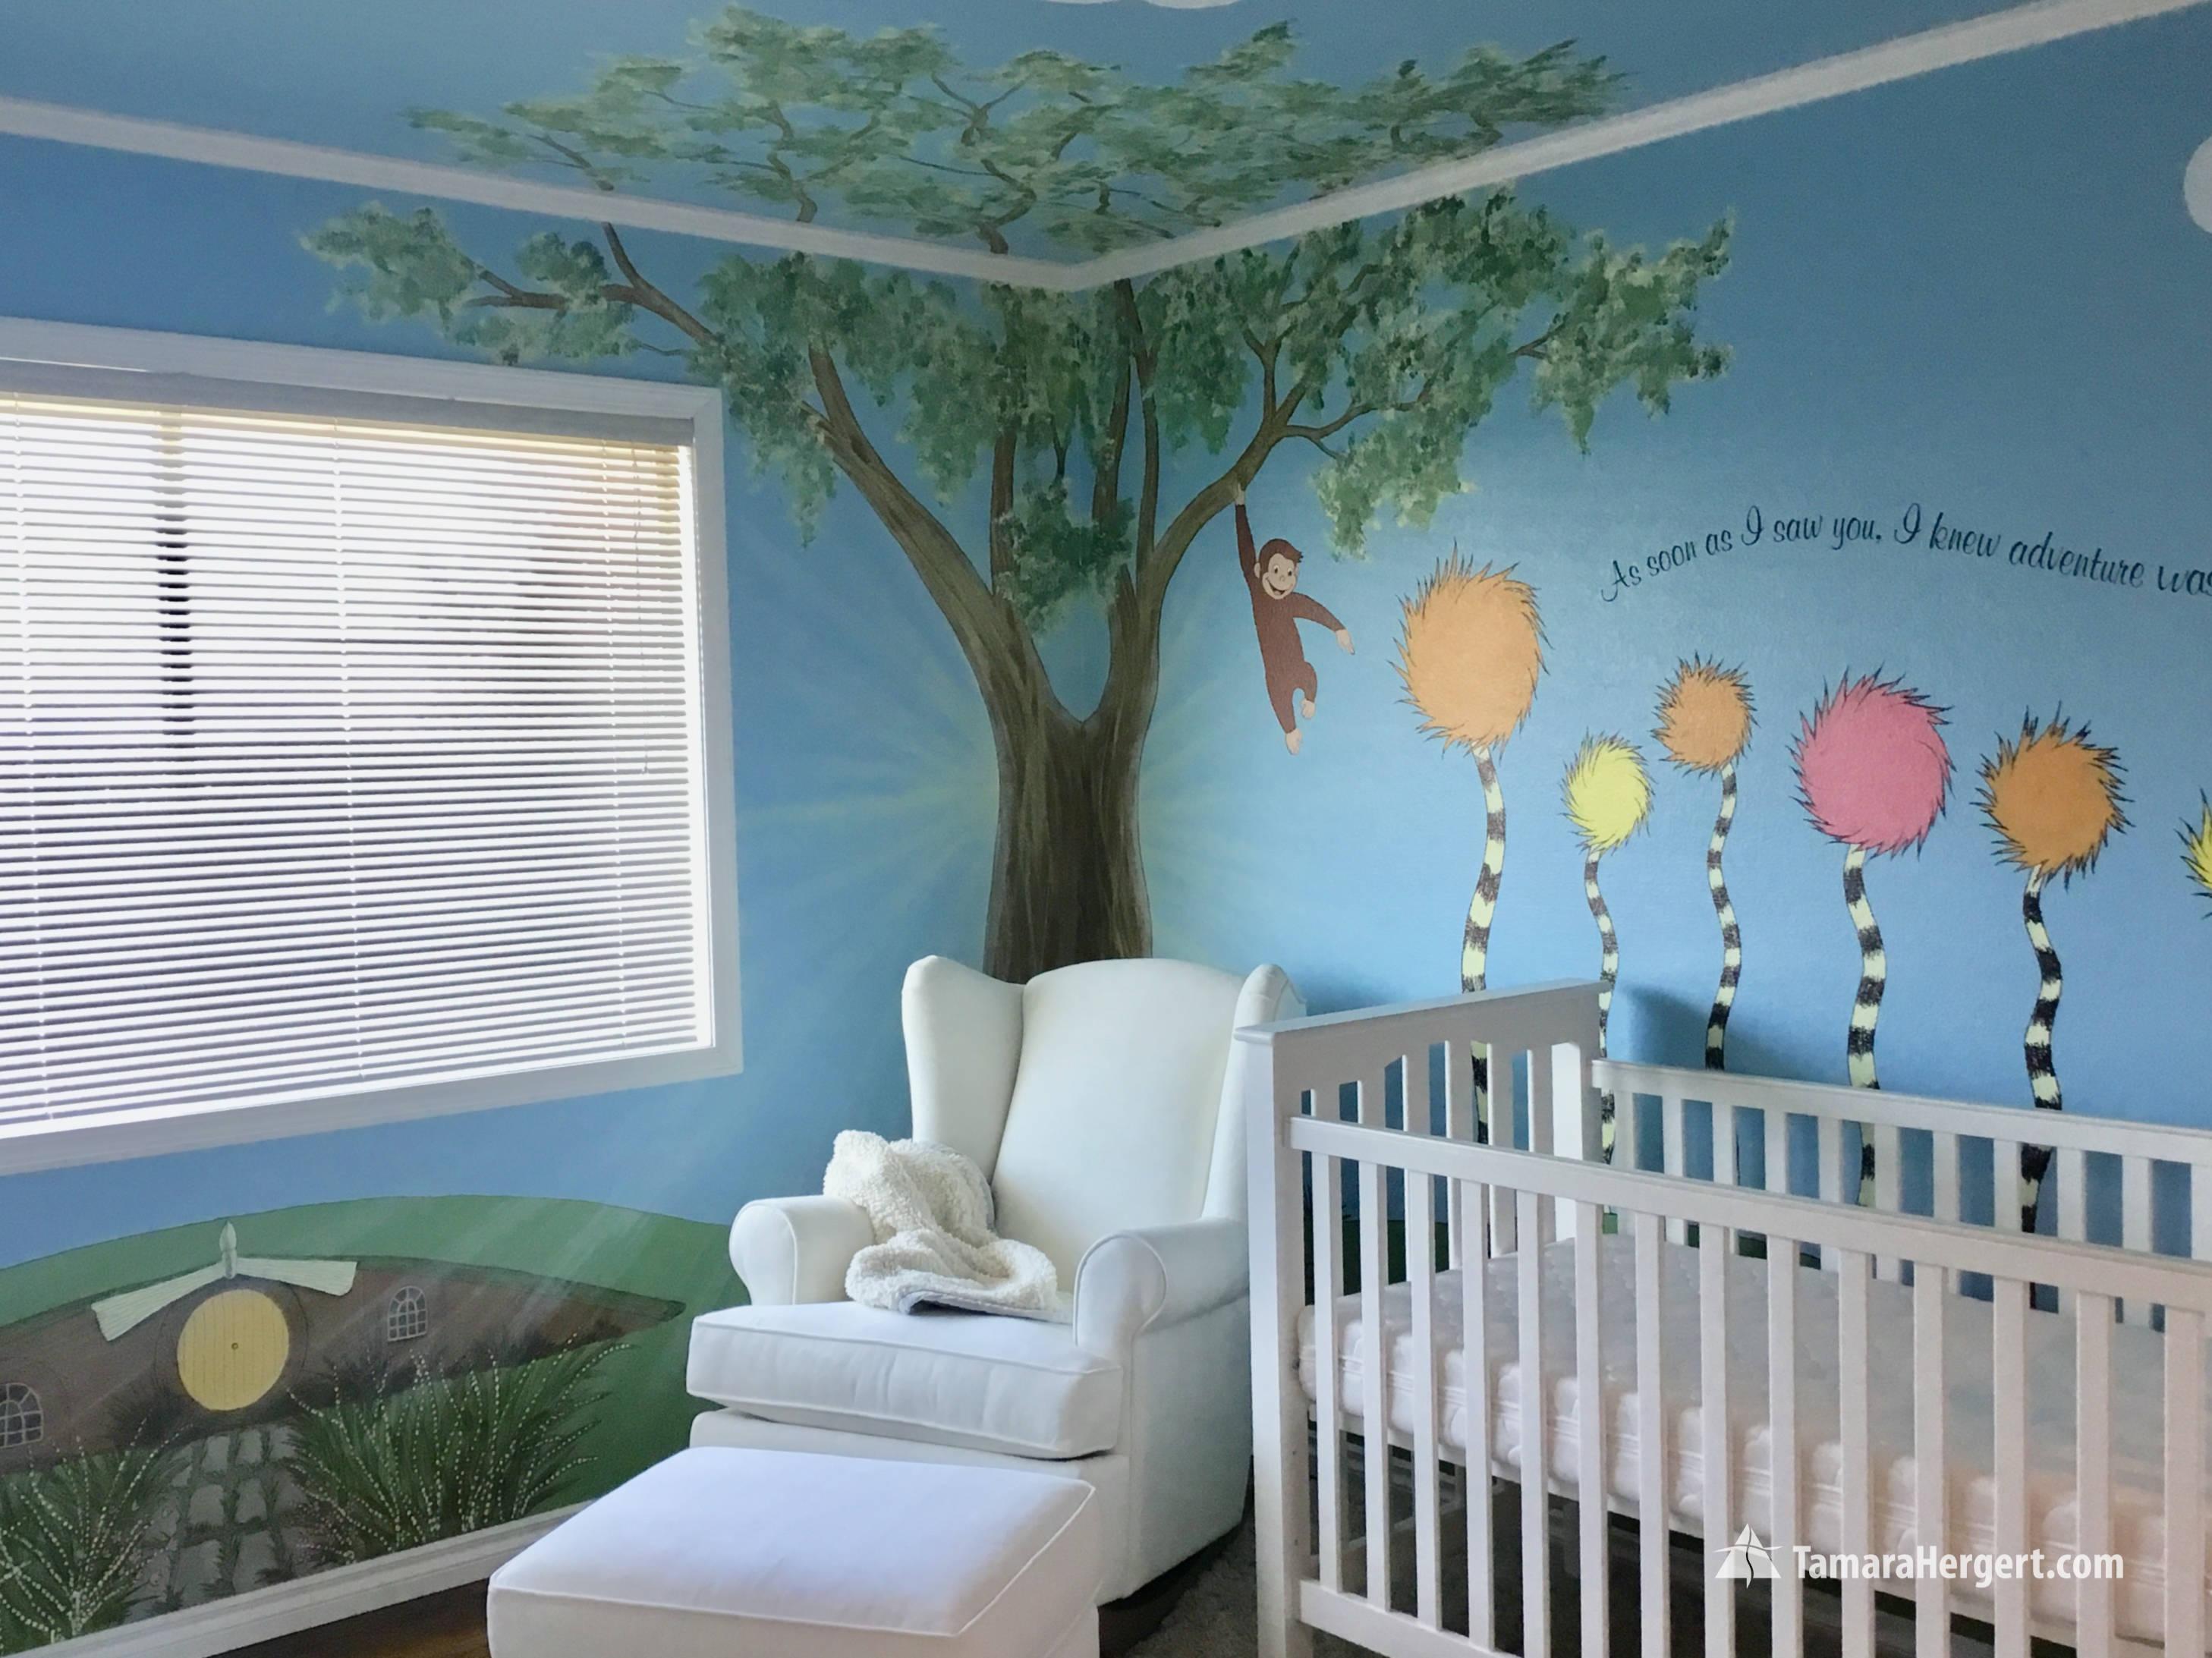 Story book mural by Tamara Hergert 31